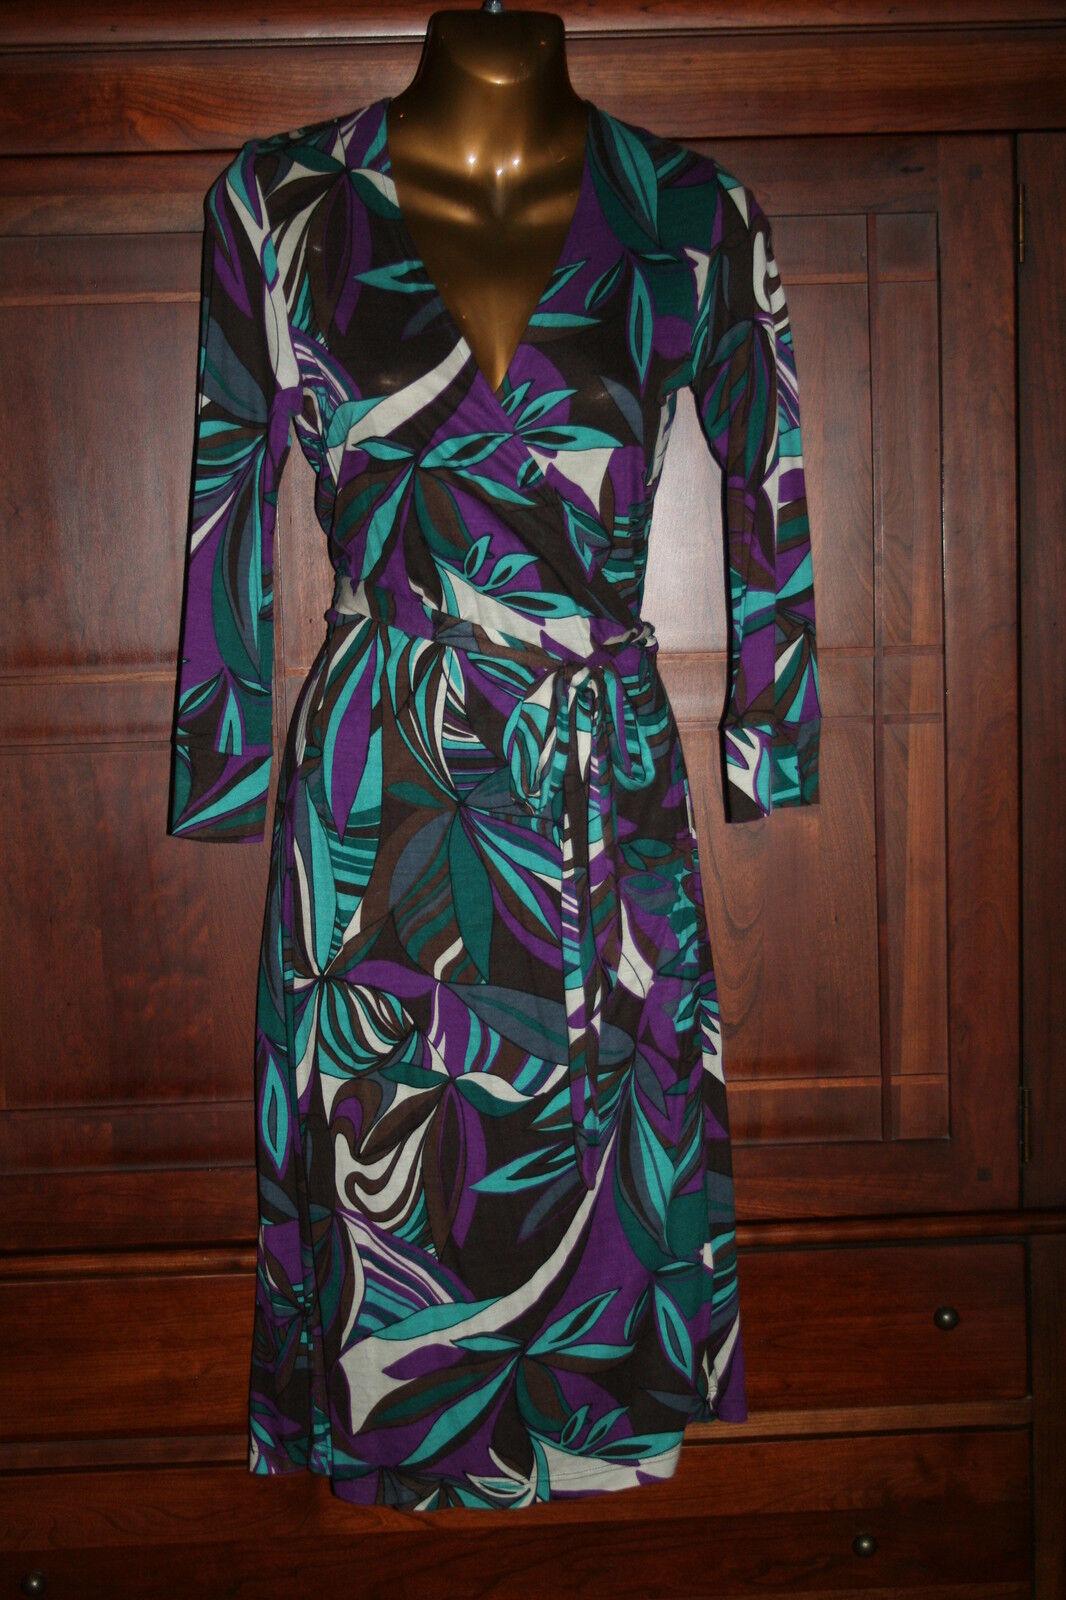 NWT Fashionista Multi-color Wrap Dress S - M